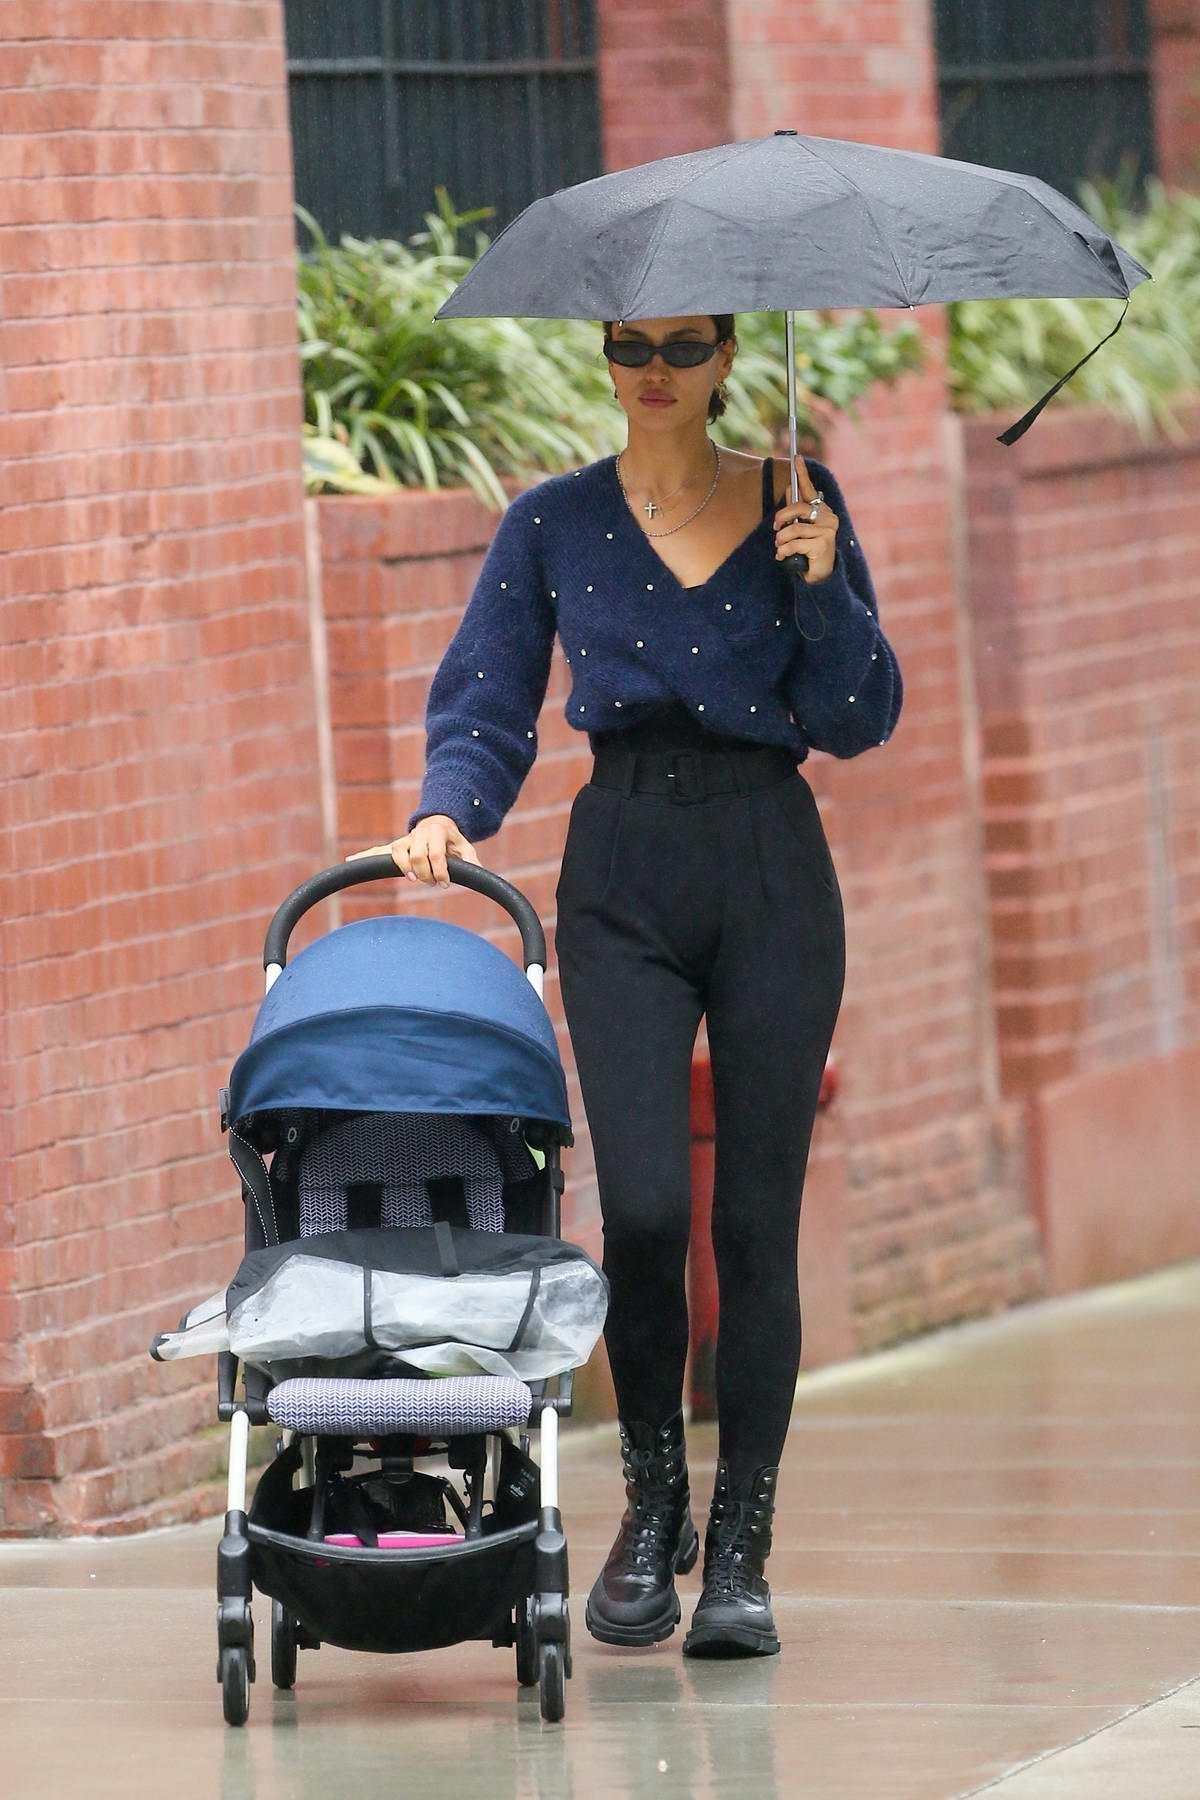 Irina Shayk seen picking her daughter up from school before enjoying a stroll in New York City